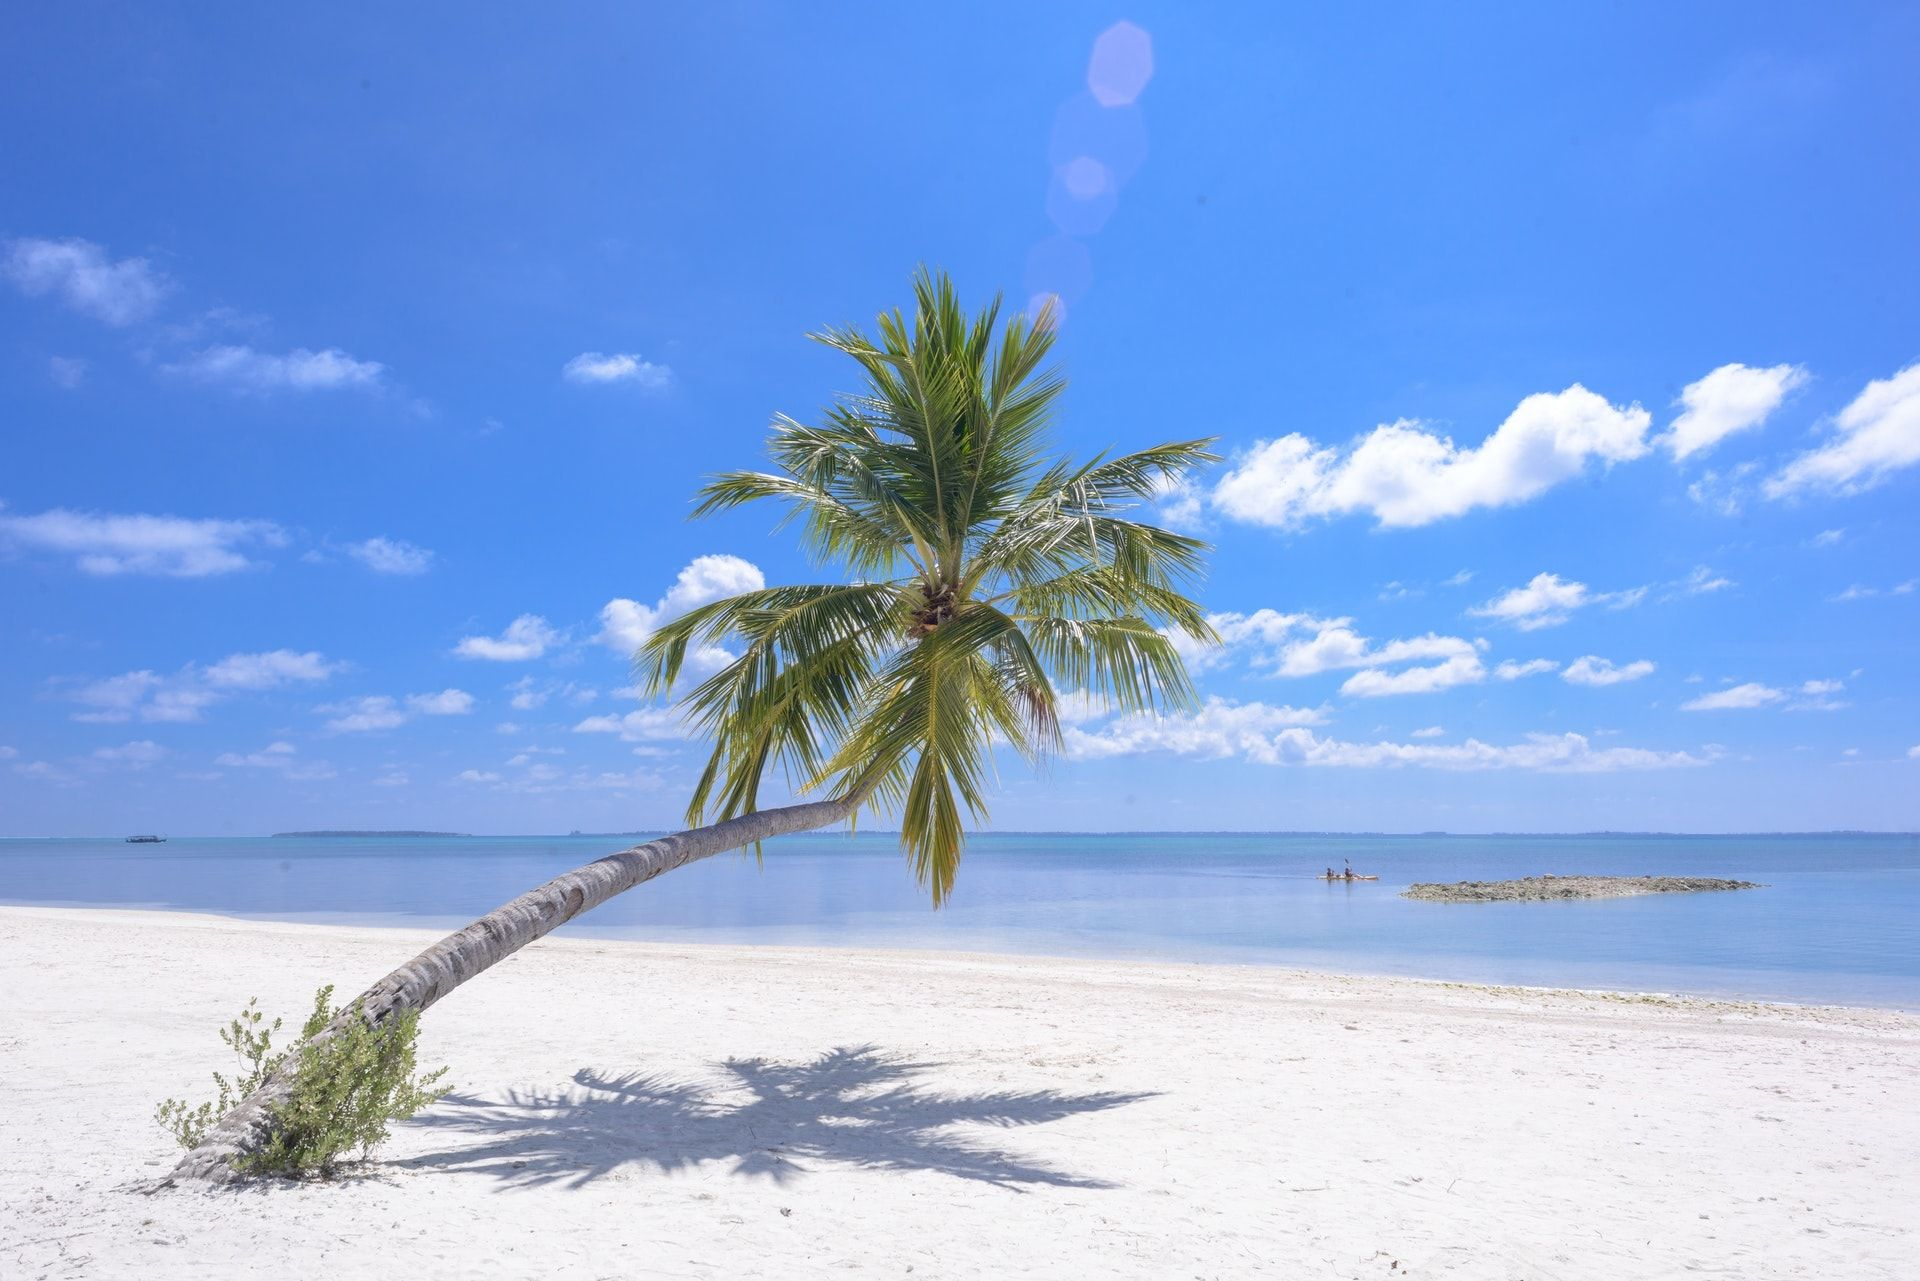 13 Gambar Pemandangan Pantai Yang Indah Dipandang Dengan Gambar